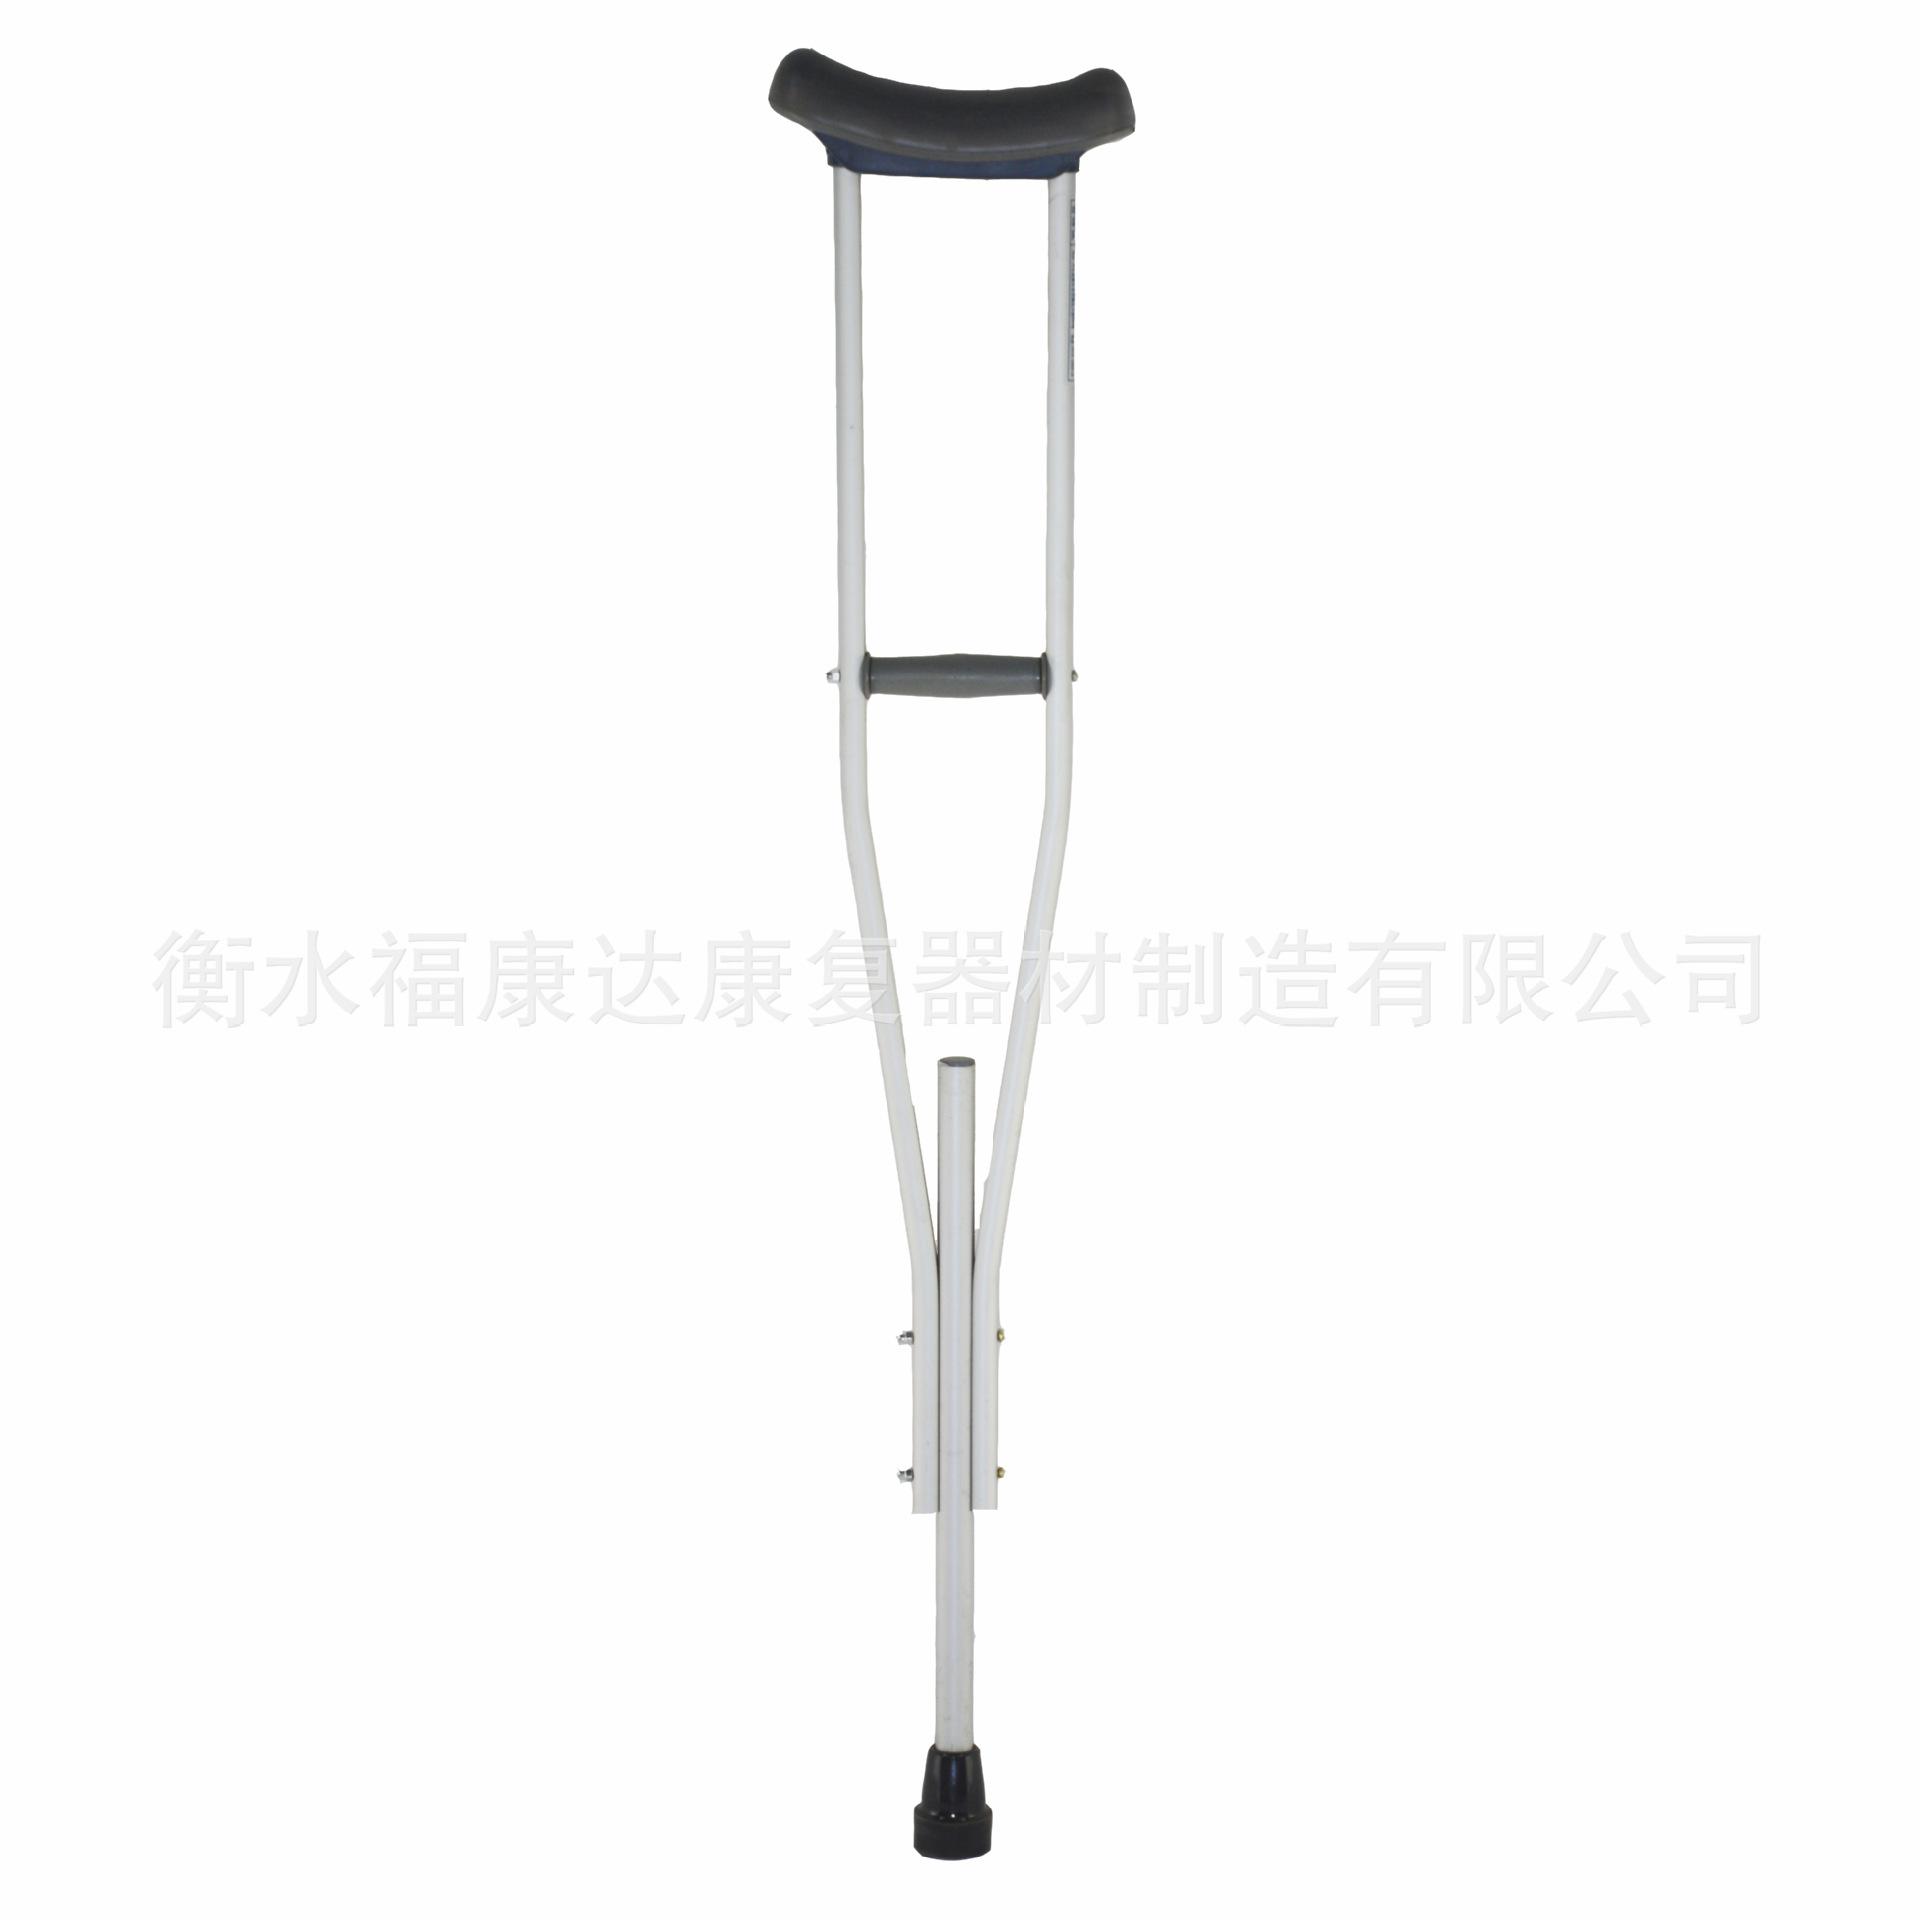 YD-FJ-030铝合金增强普通儿童拐杖.jpg